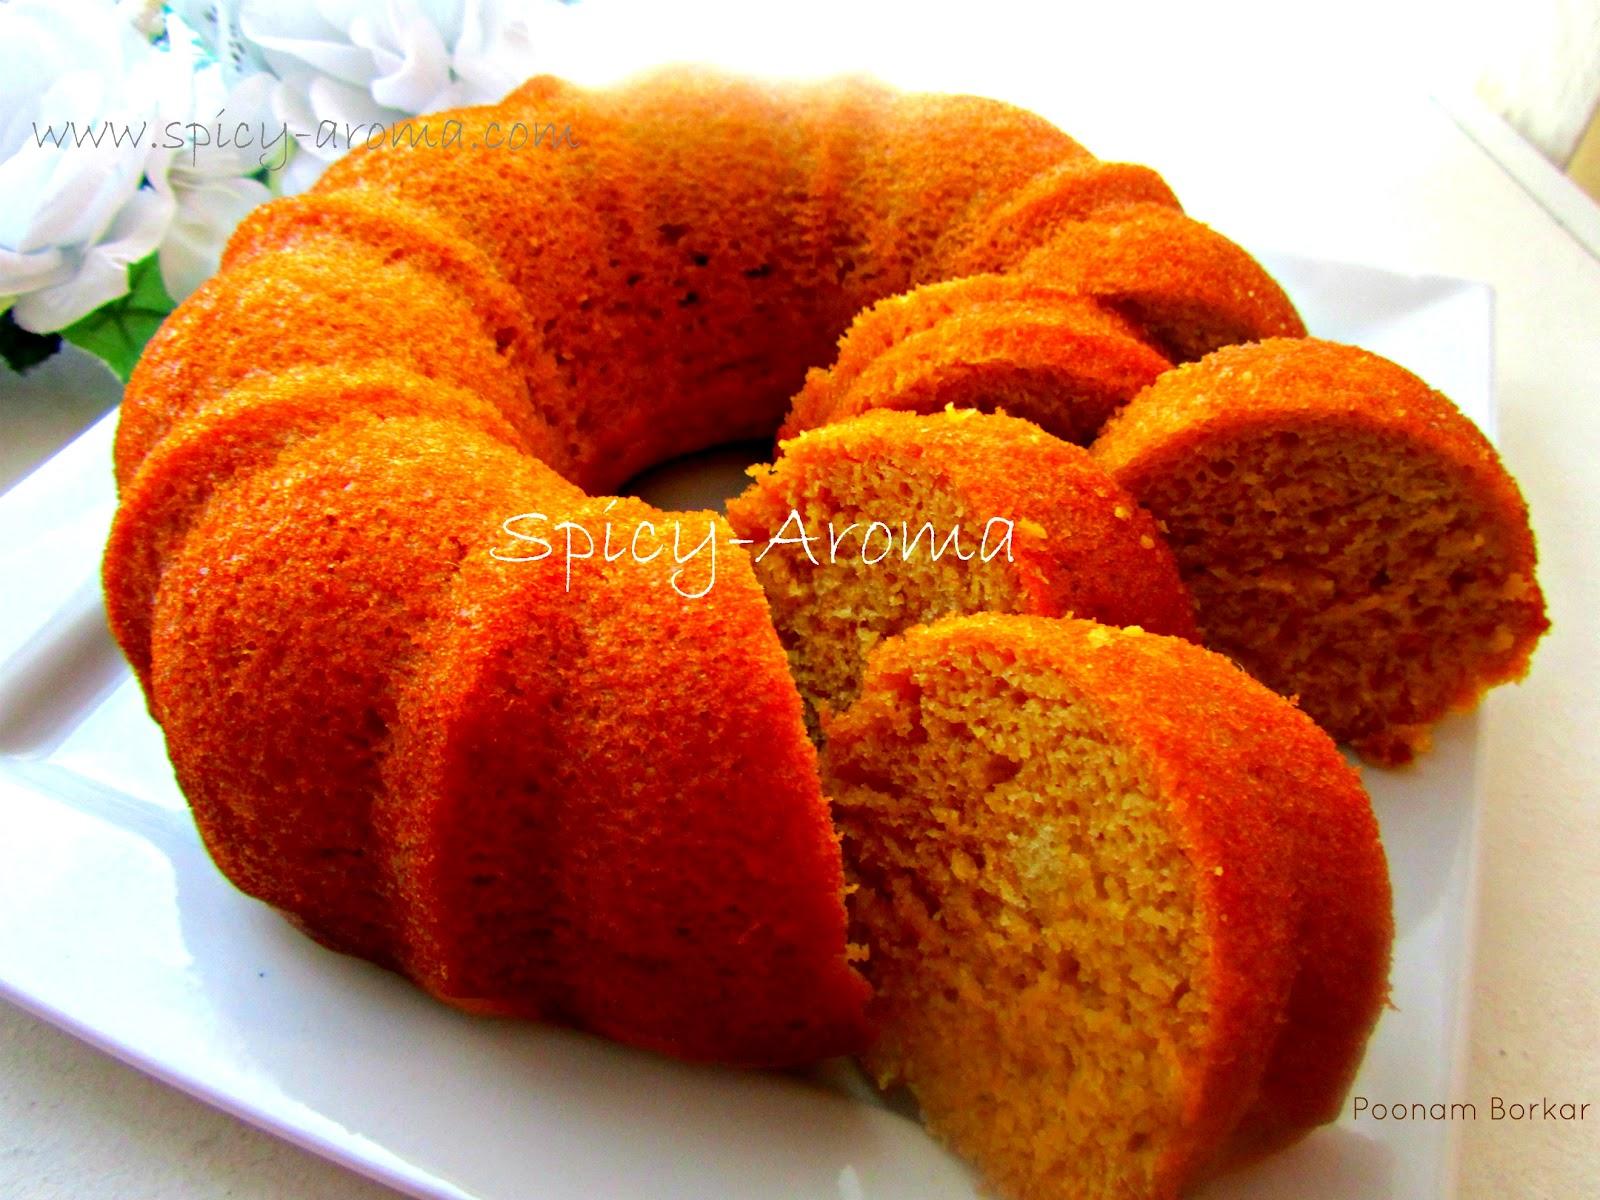 Mango Cake Spicy-Aroma